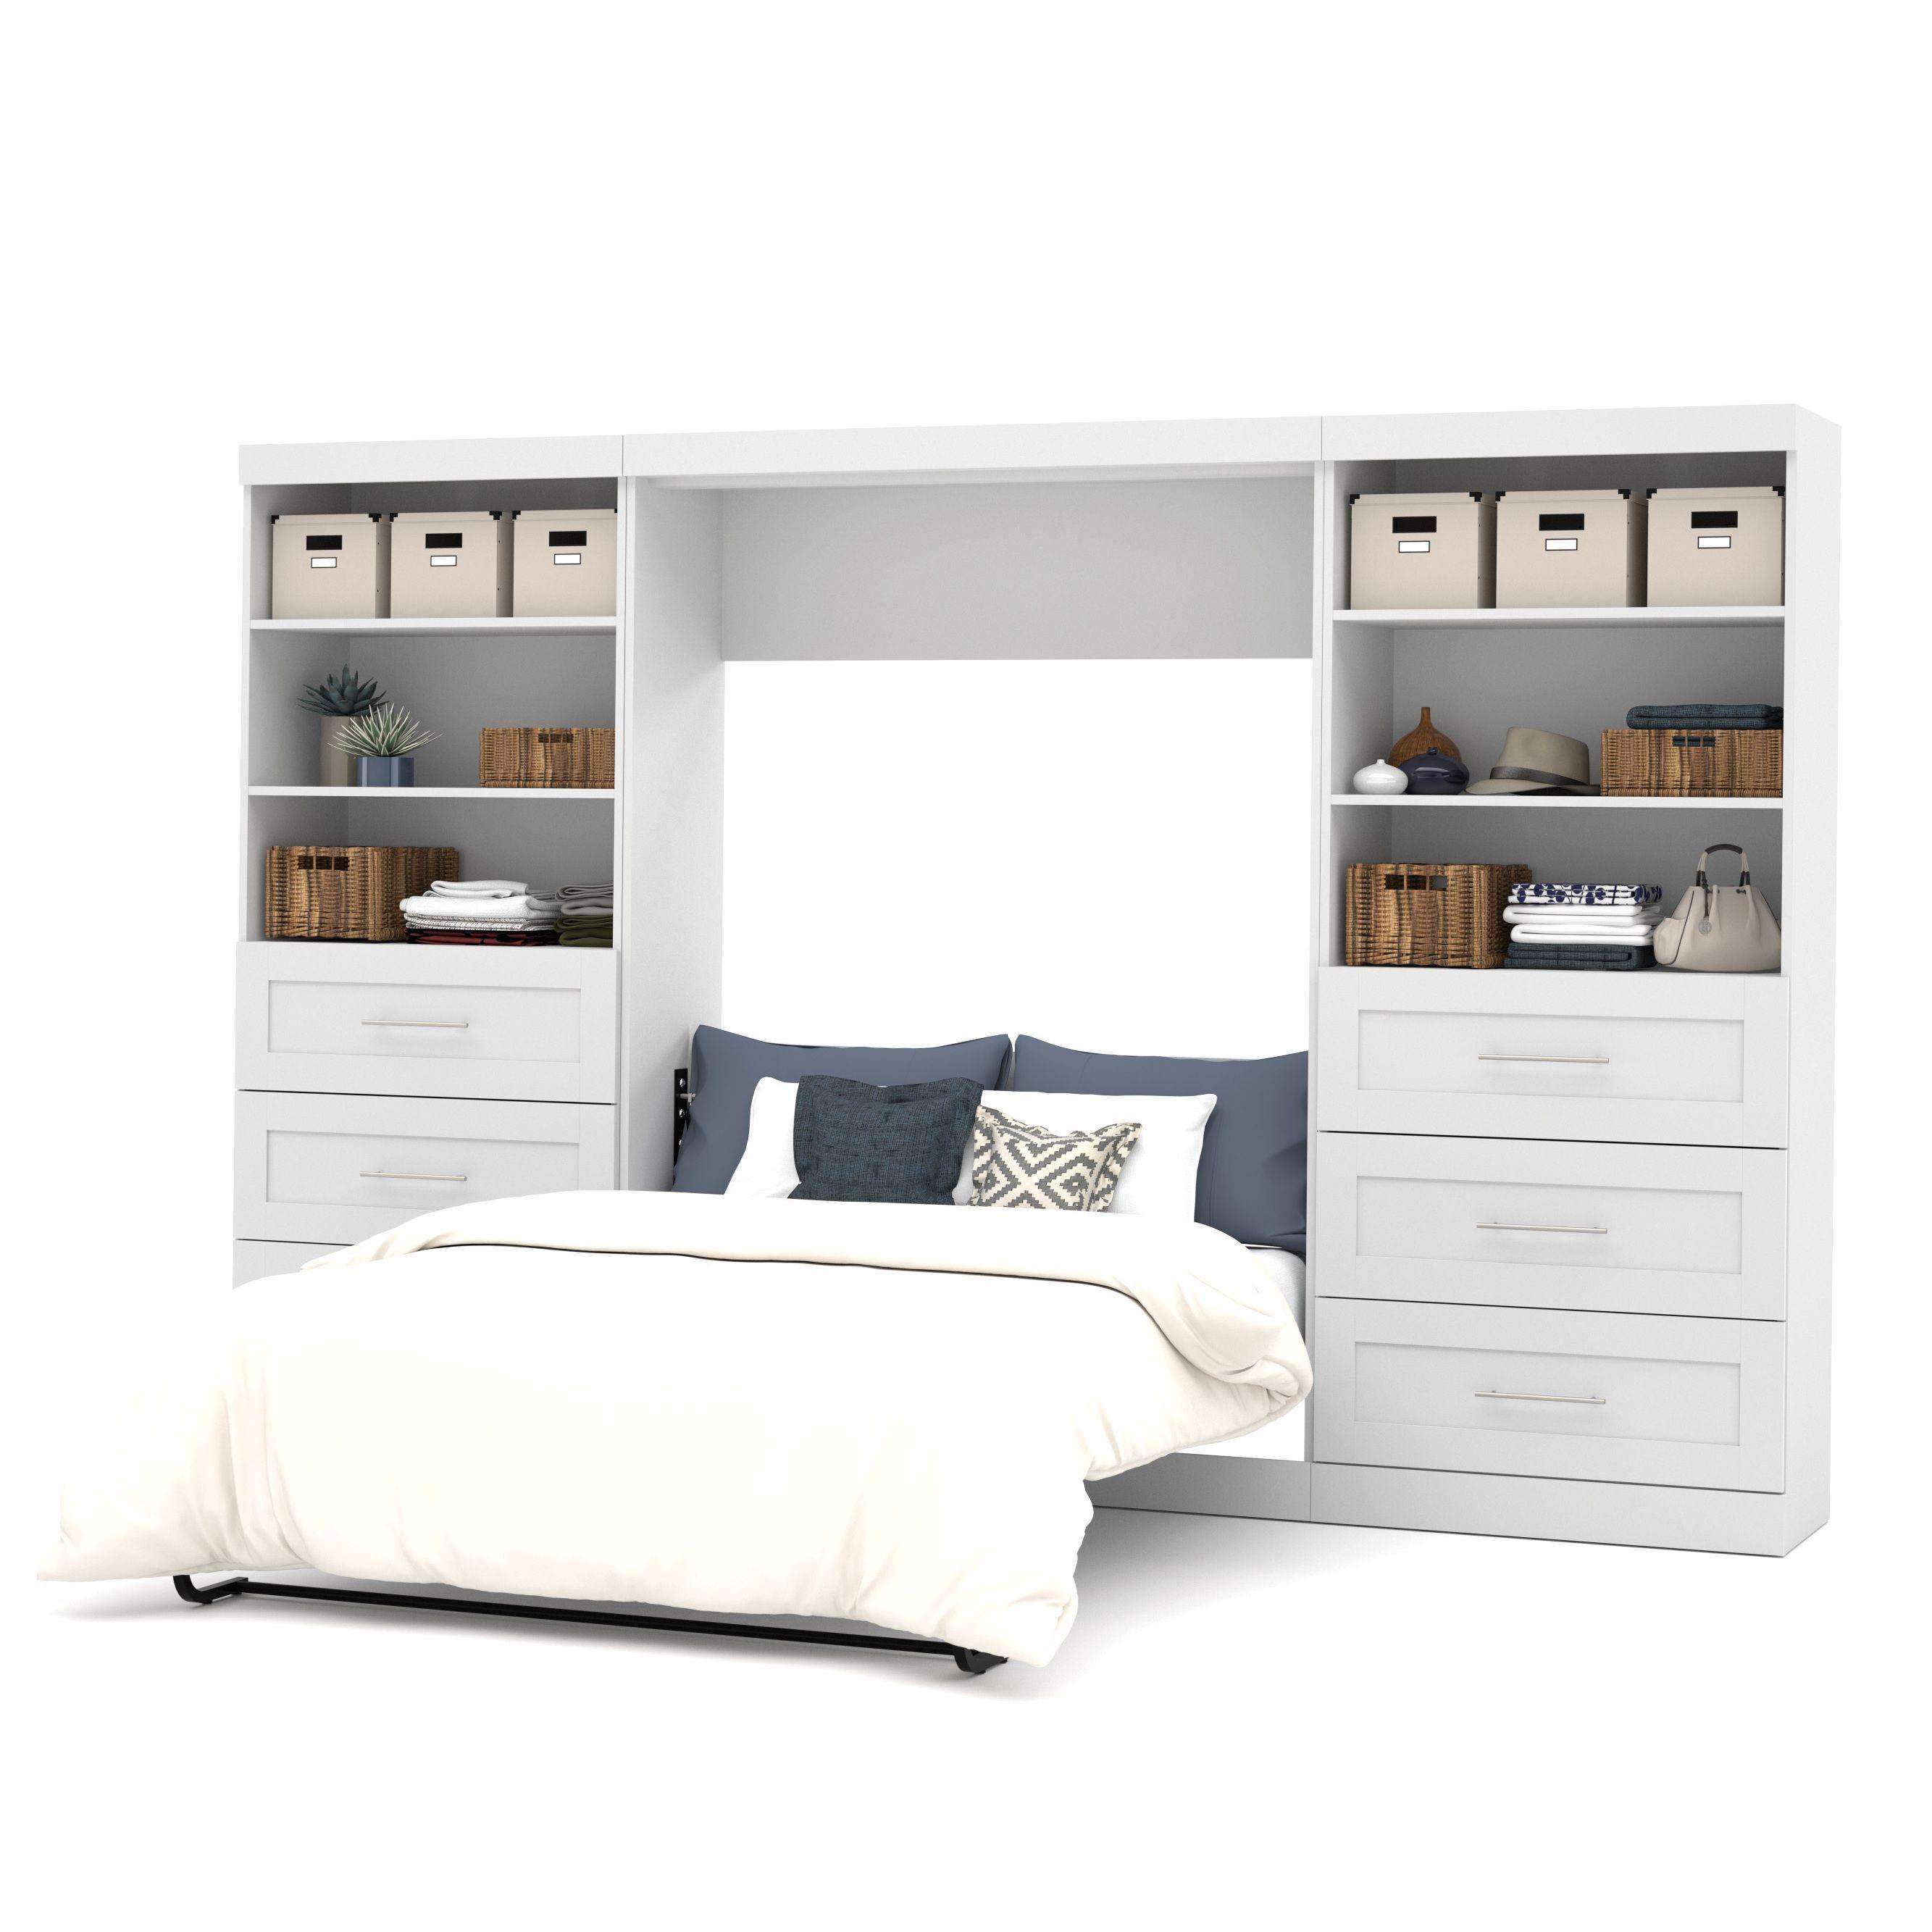 Pur by Bestar 131 Full Wall Bed Kit (White) Modern